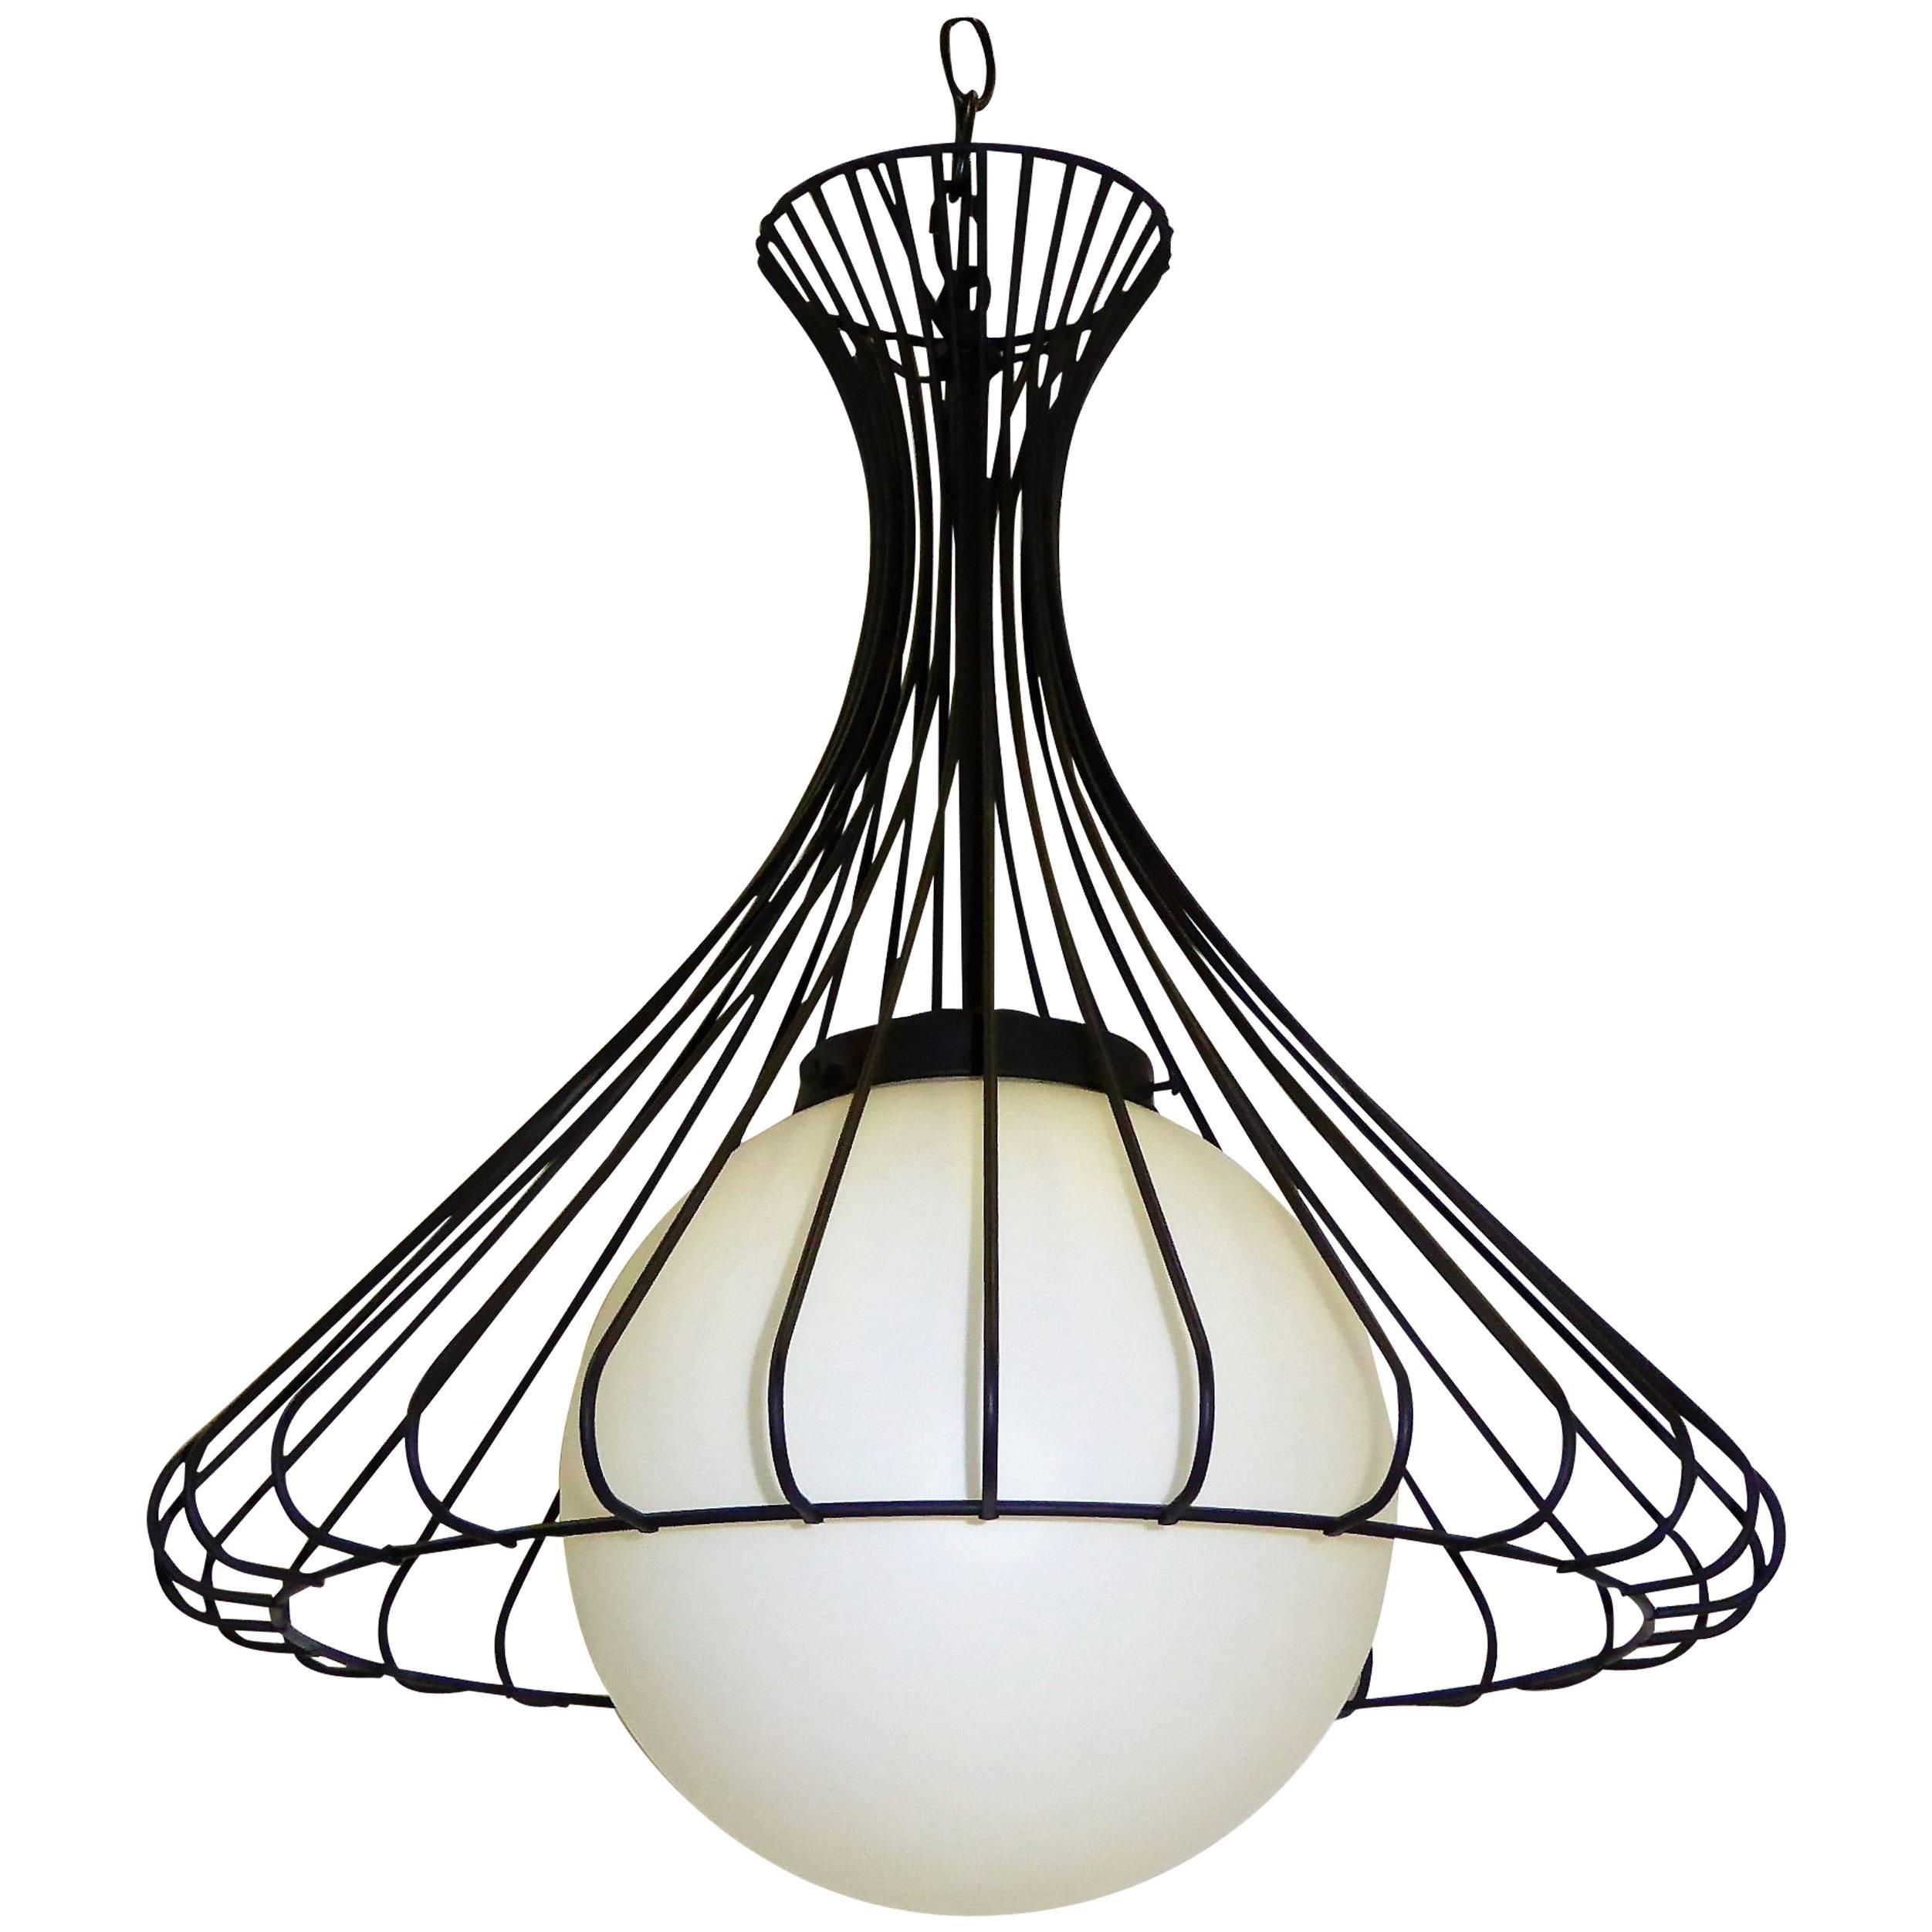 Steel Wire Chandelier Center Wiring A 1950s Satin Glass Globe With Sculptural Bell Rh 1stdibs Com Diagram Frame